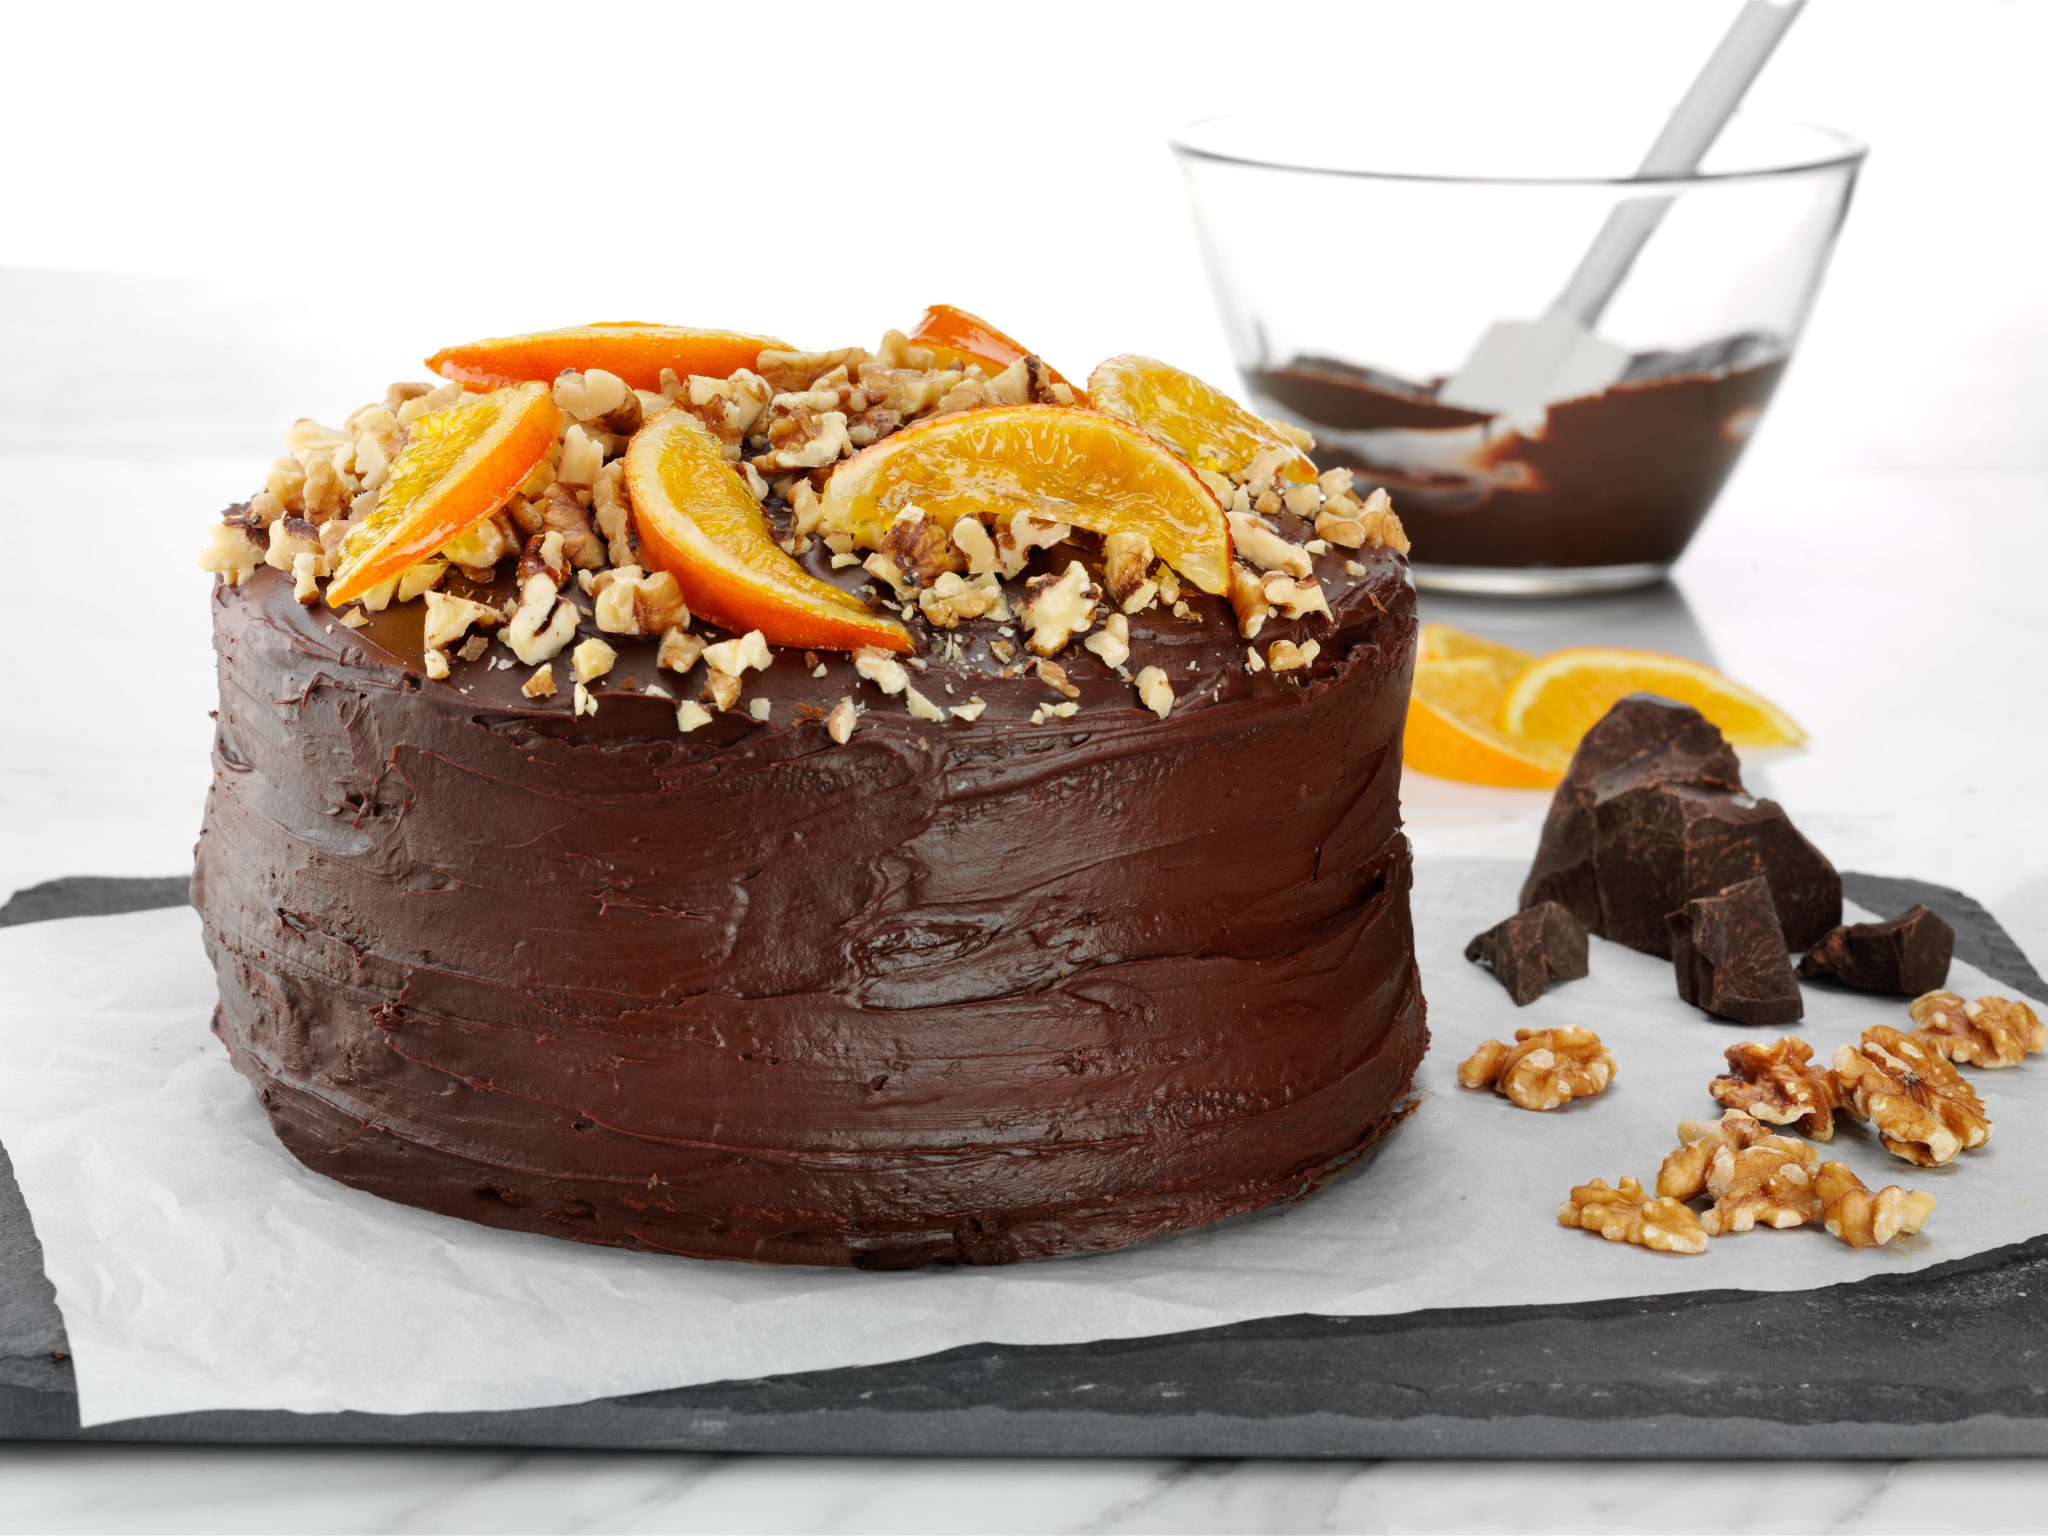 Erna's Gourmet Chocolate Cake